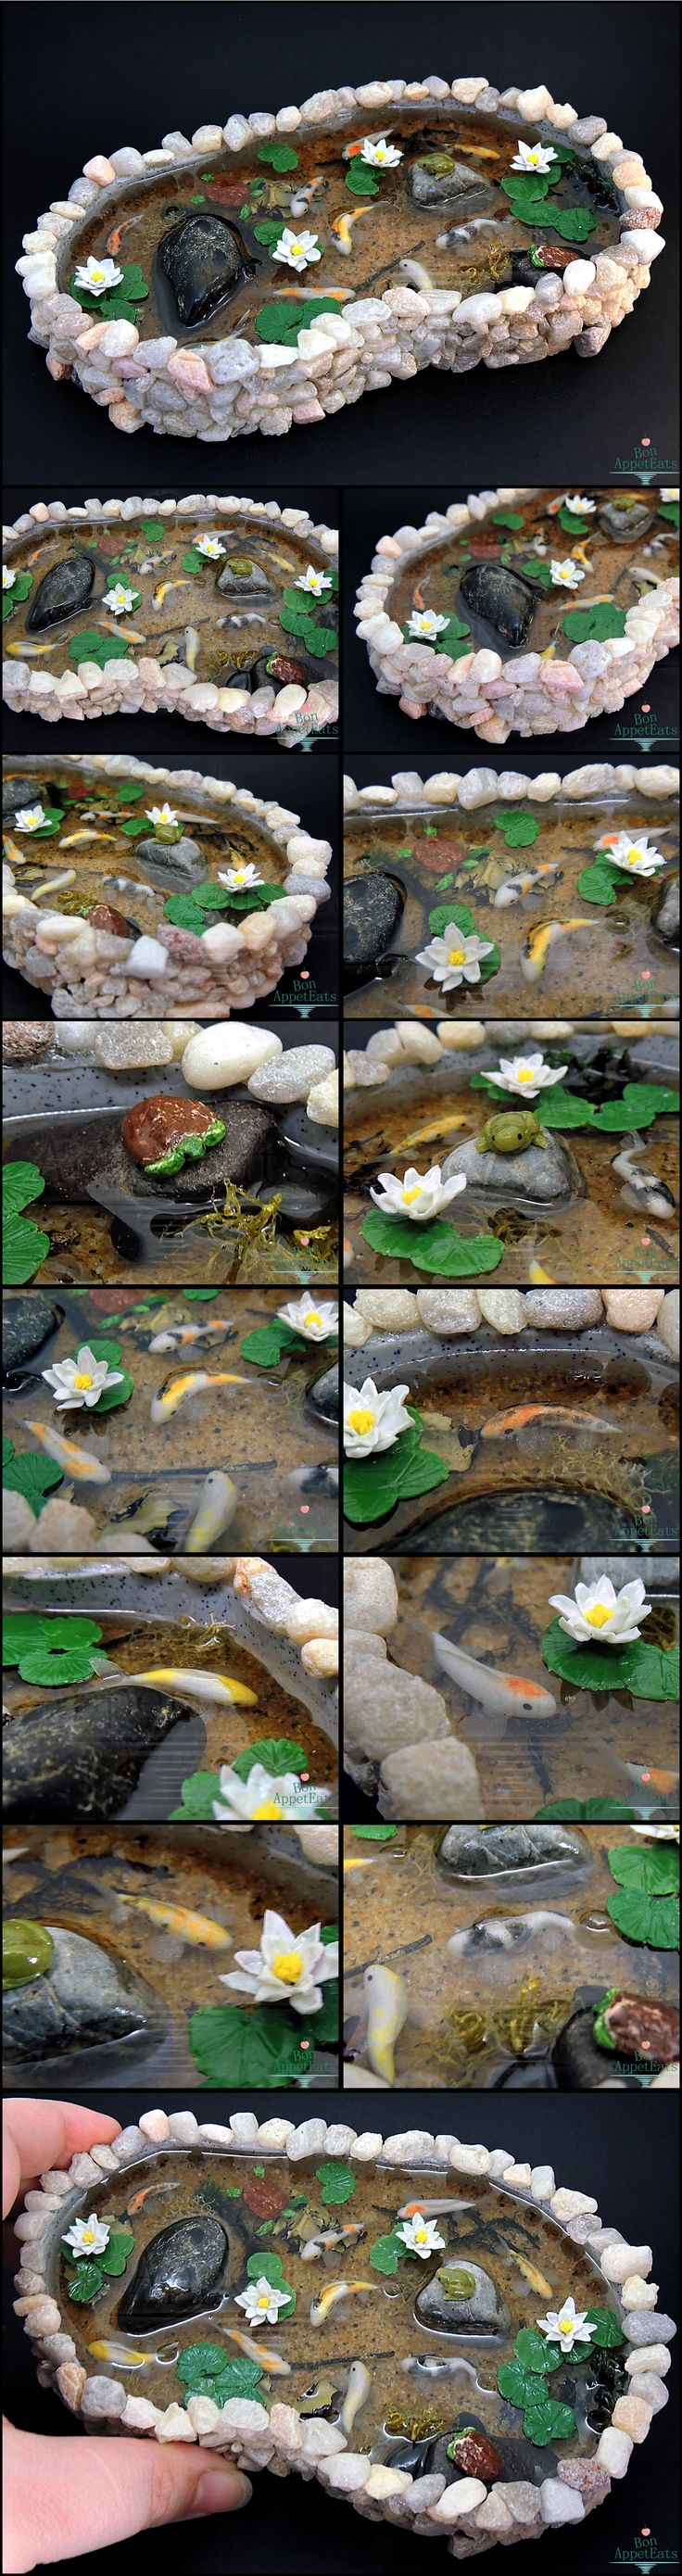 Commission: Large Stone Pond by Bon-AppetEats.deviantart.com on @deviantART